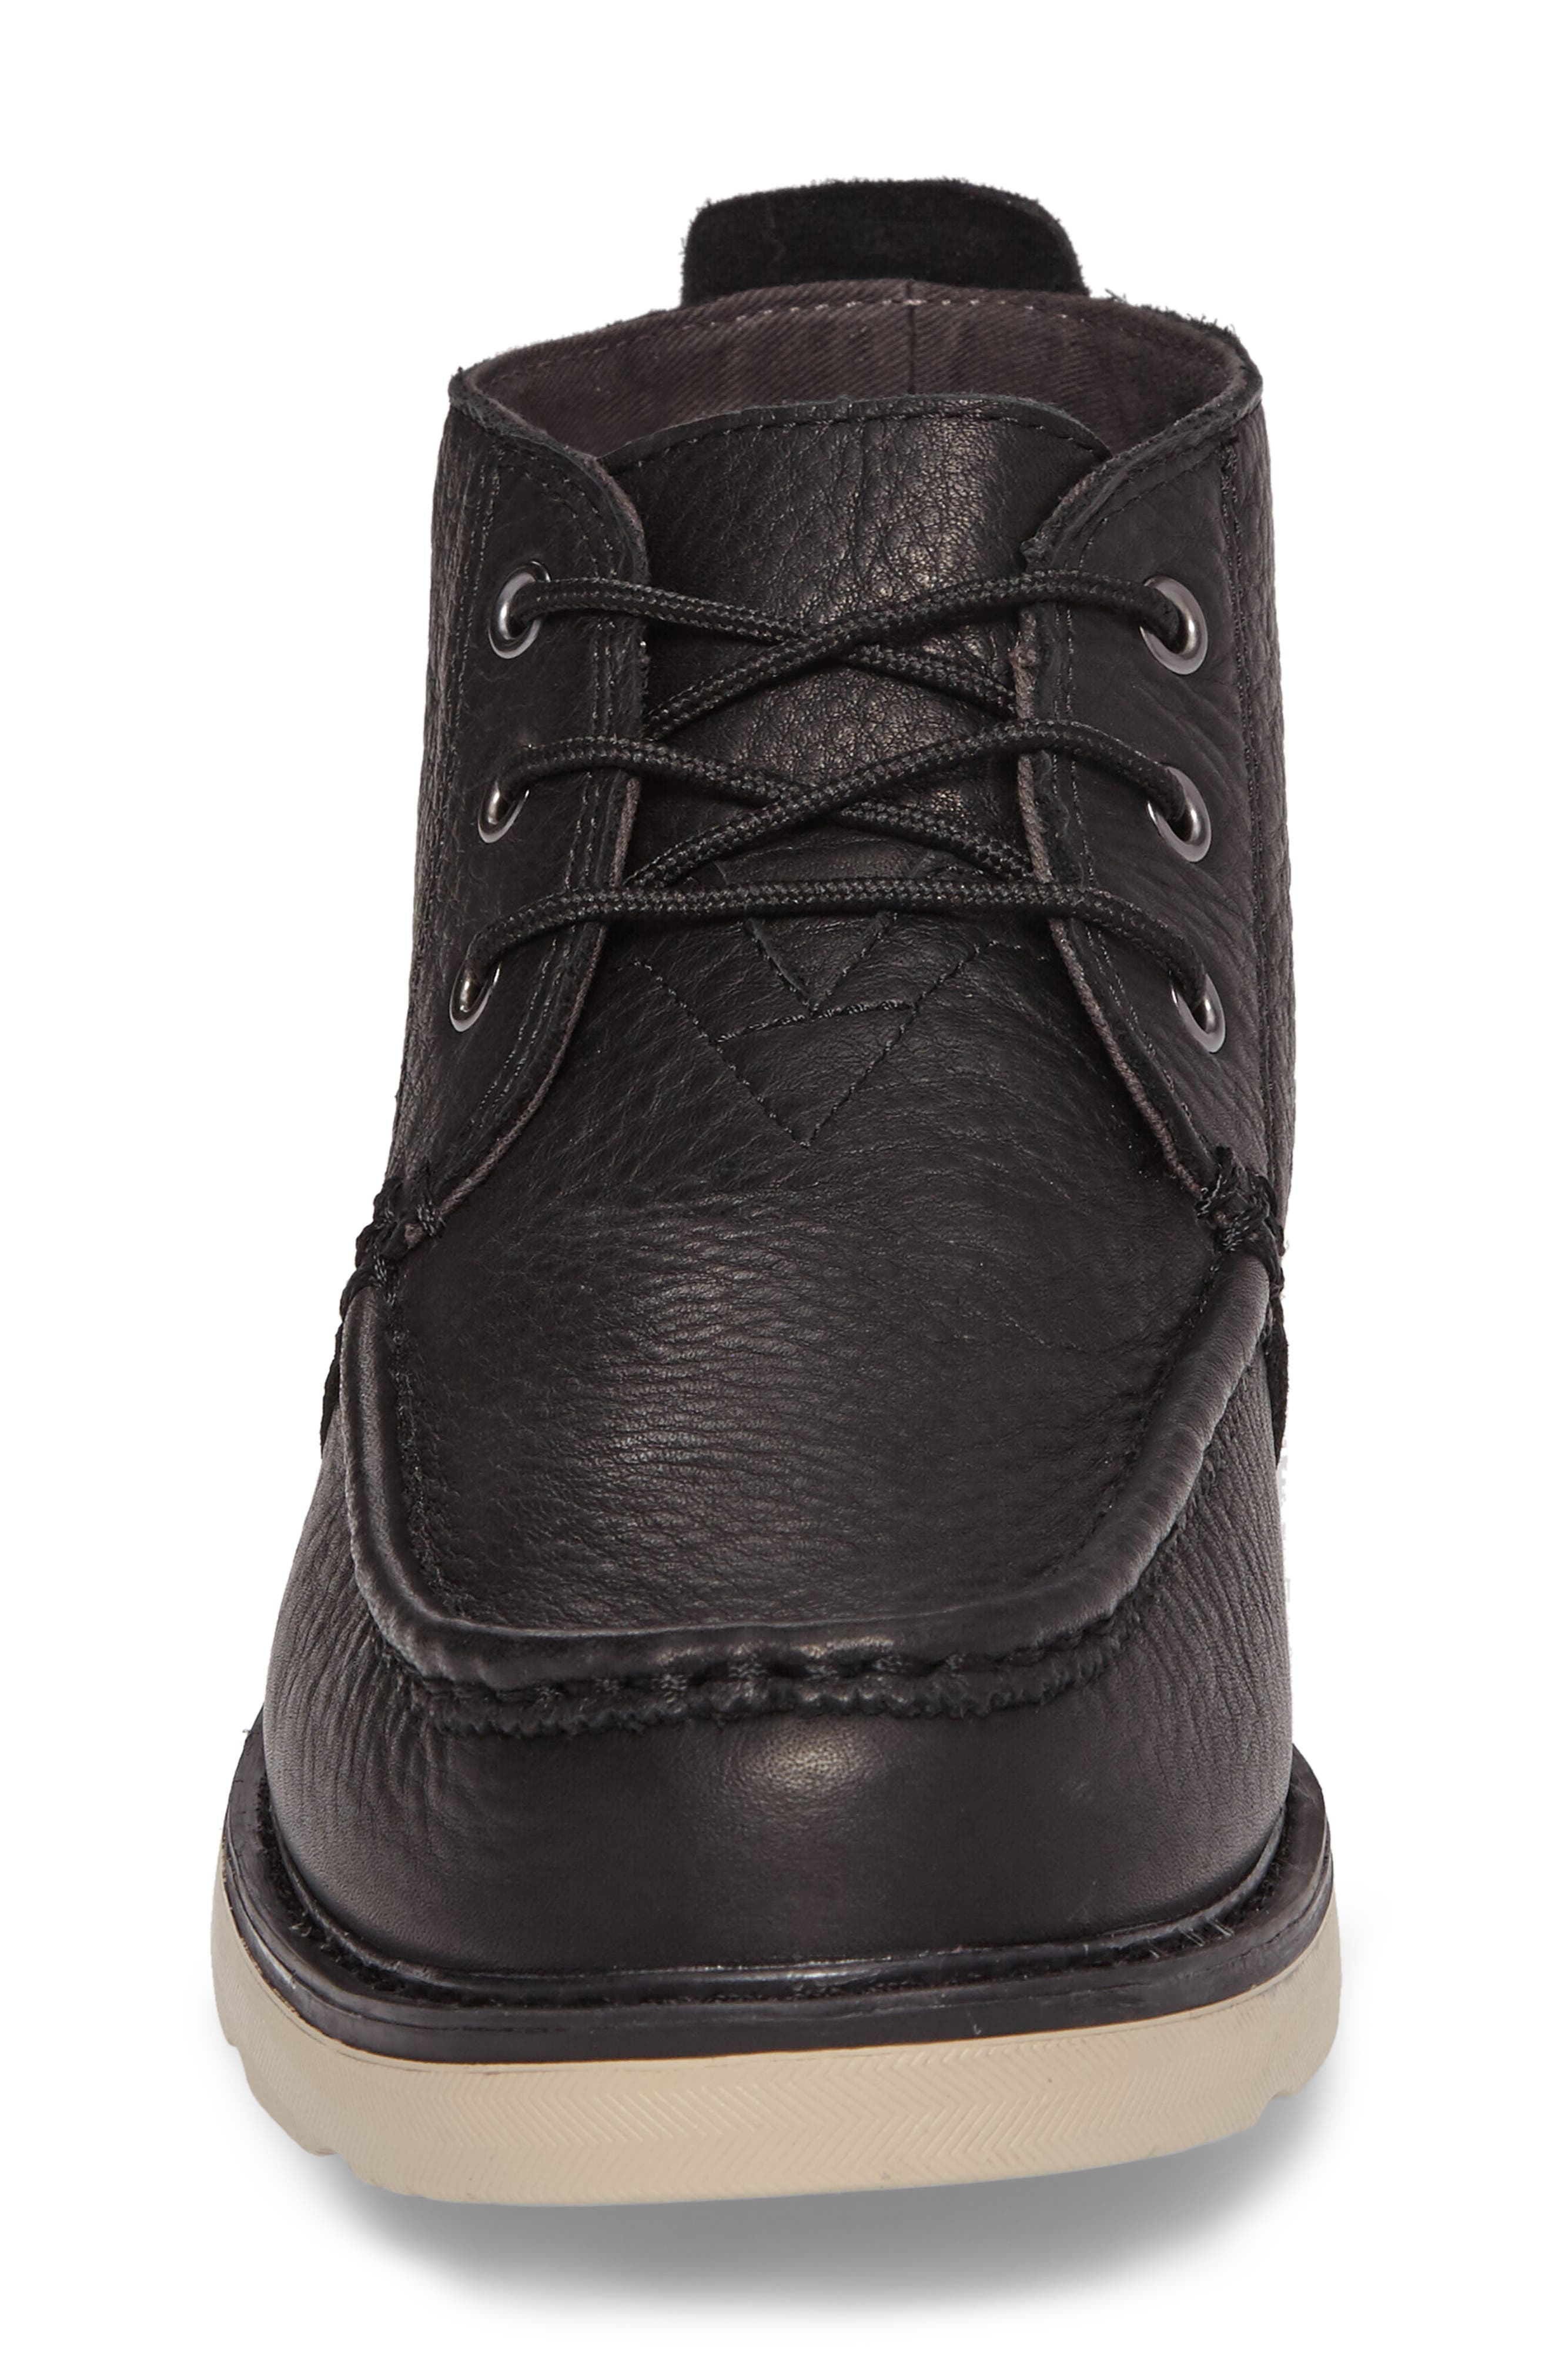 Chukka Boot,                             Alternate thumbnail 4, color,                             Black/Black Leather